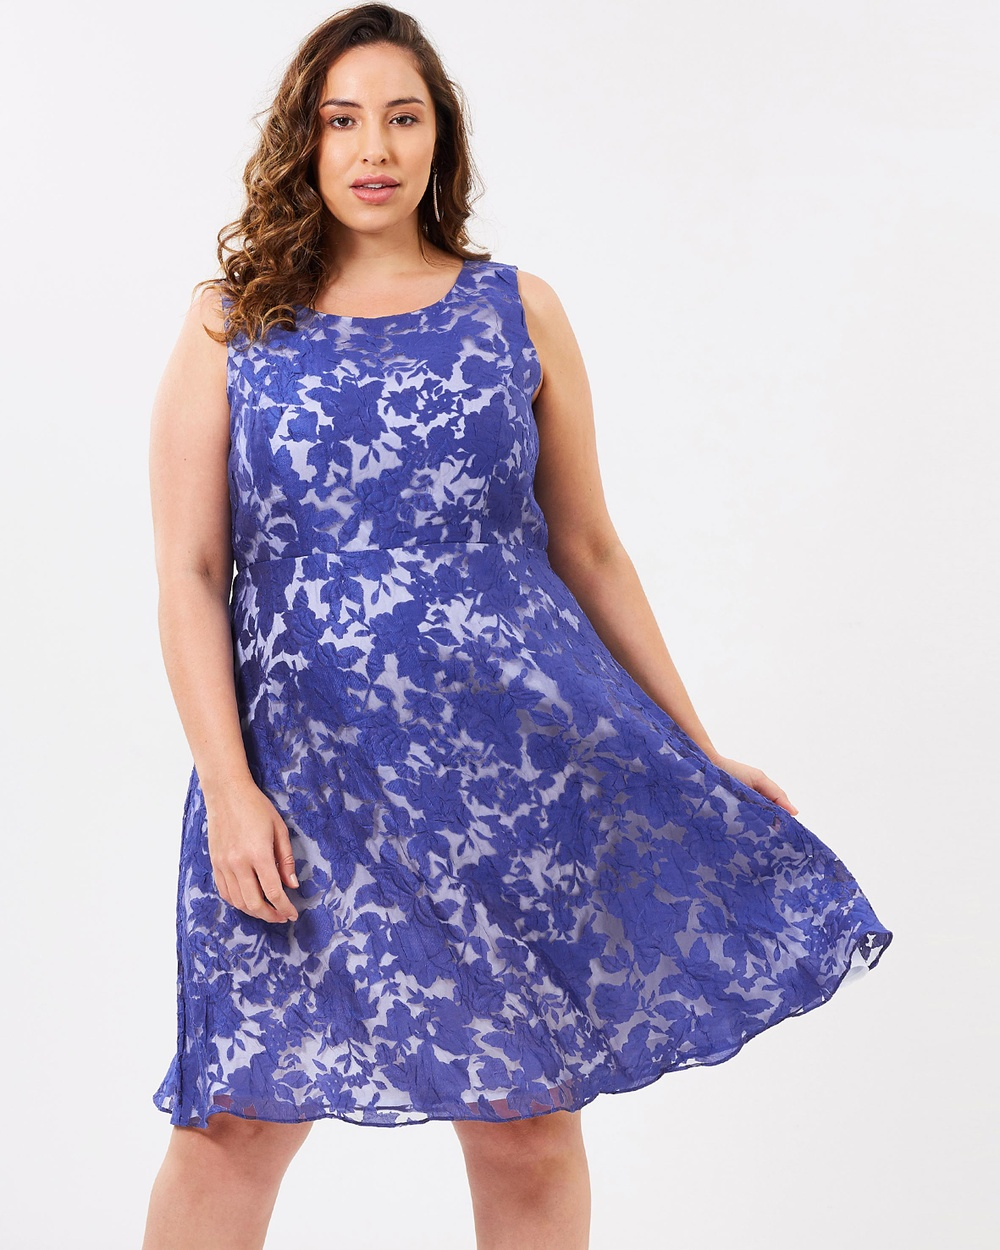 Studio 8 Kew Dress Dresses Cobalt Ivory Kew Dress